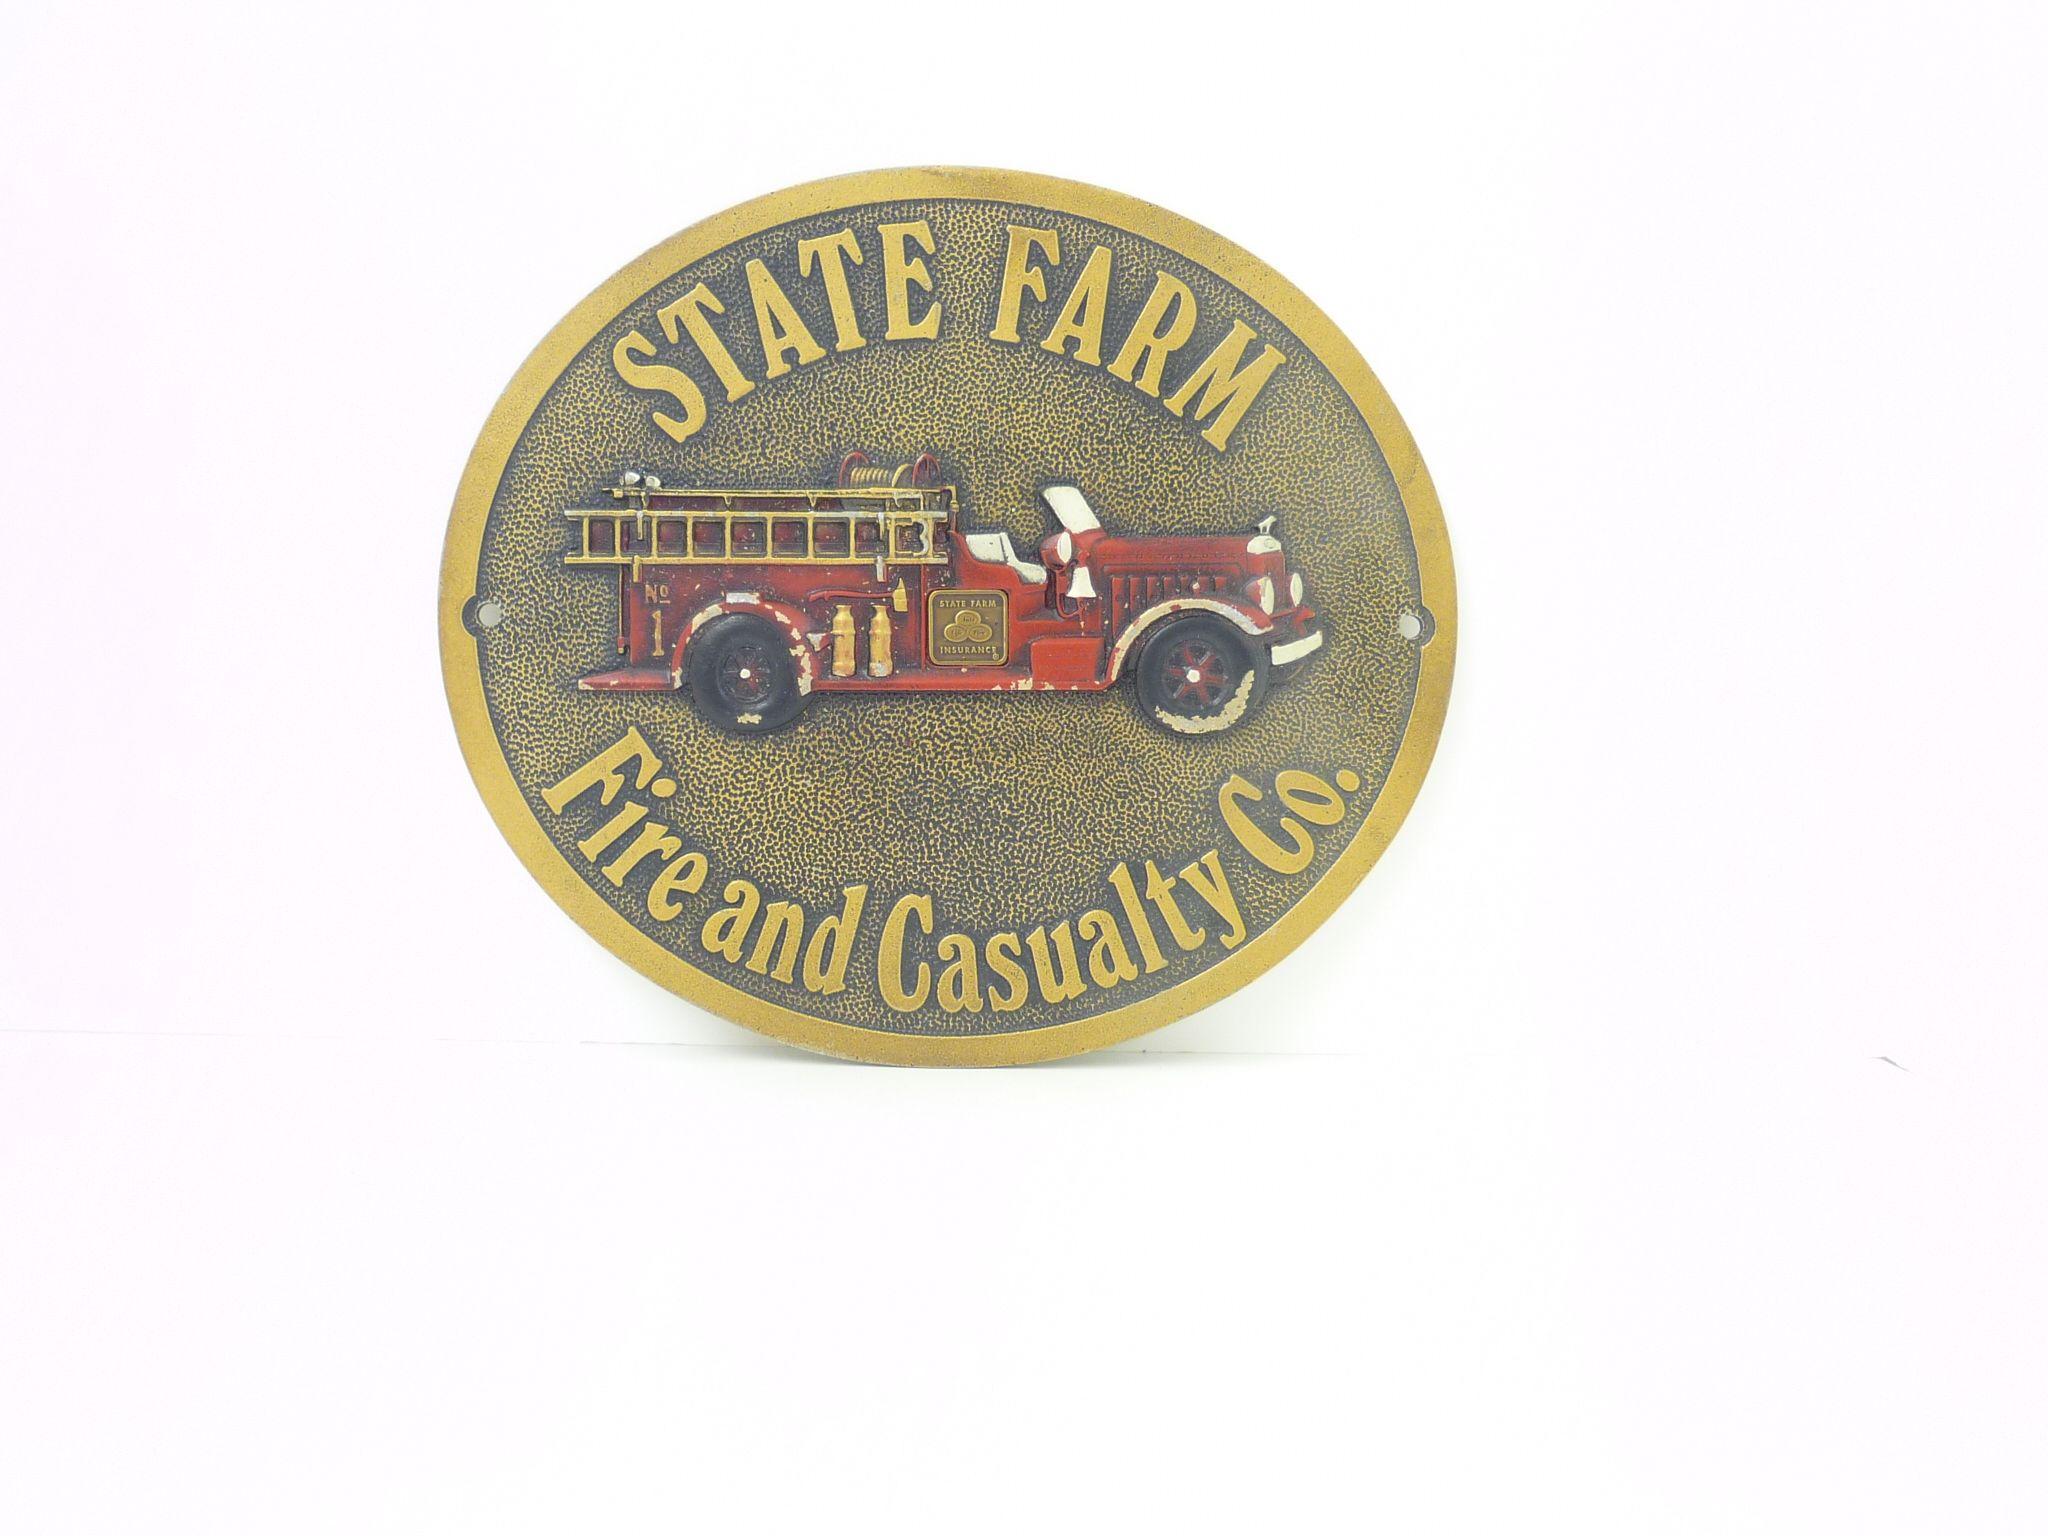 best 25 state farm insurance ideas on pinterest